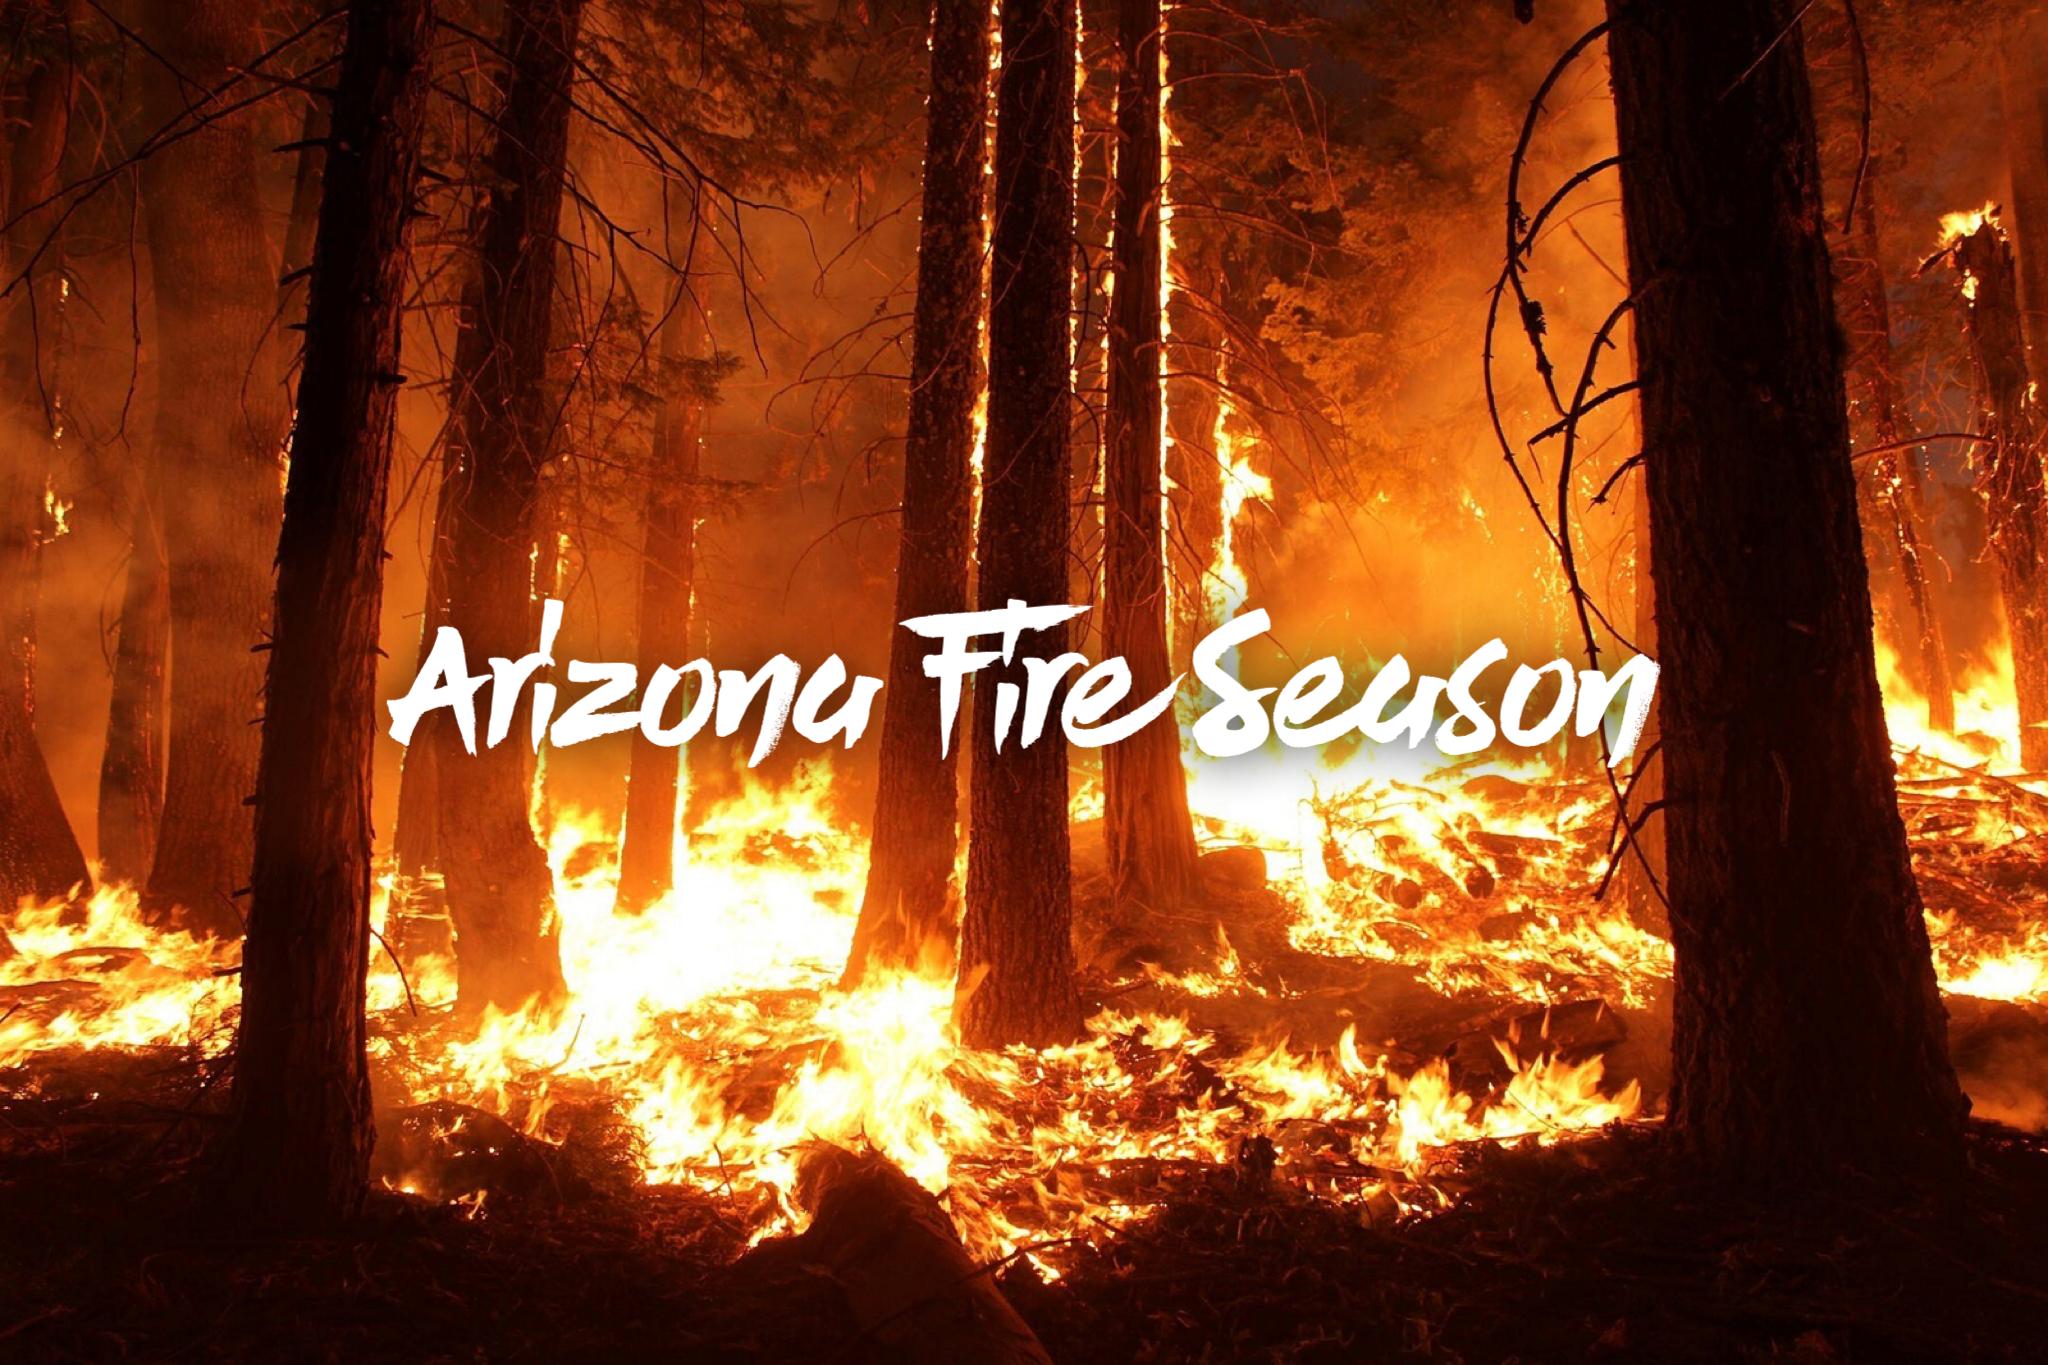 Arizona Fire Season